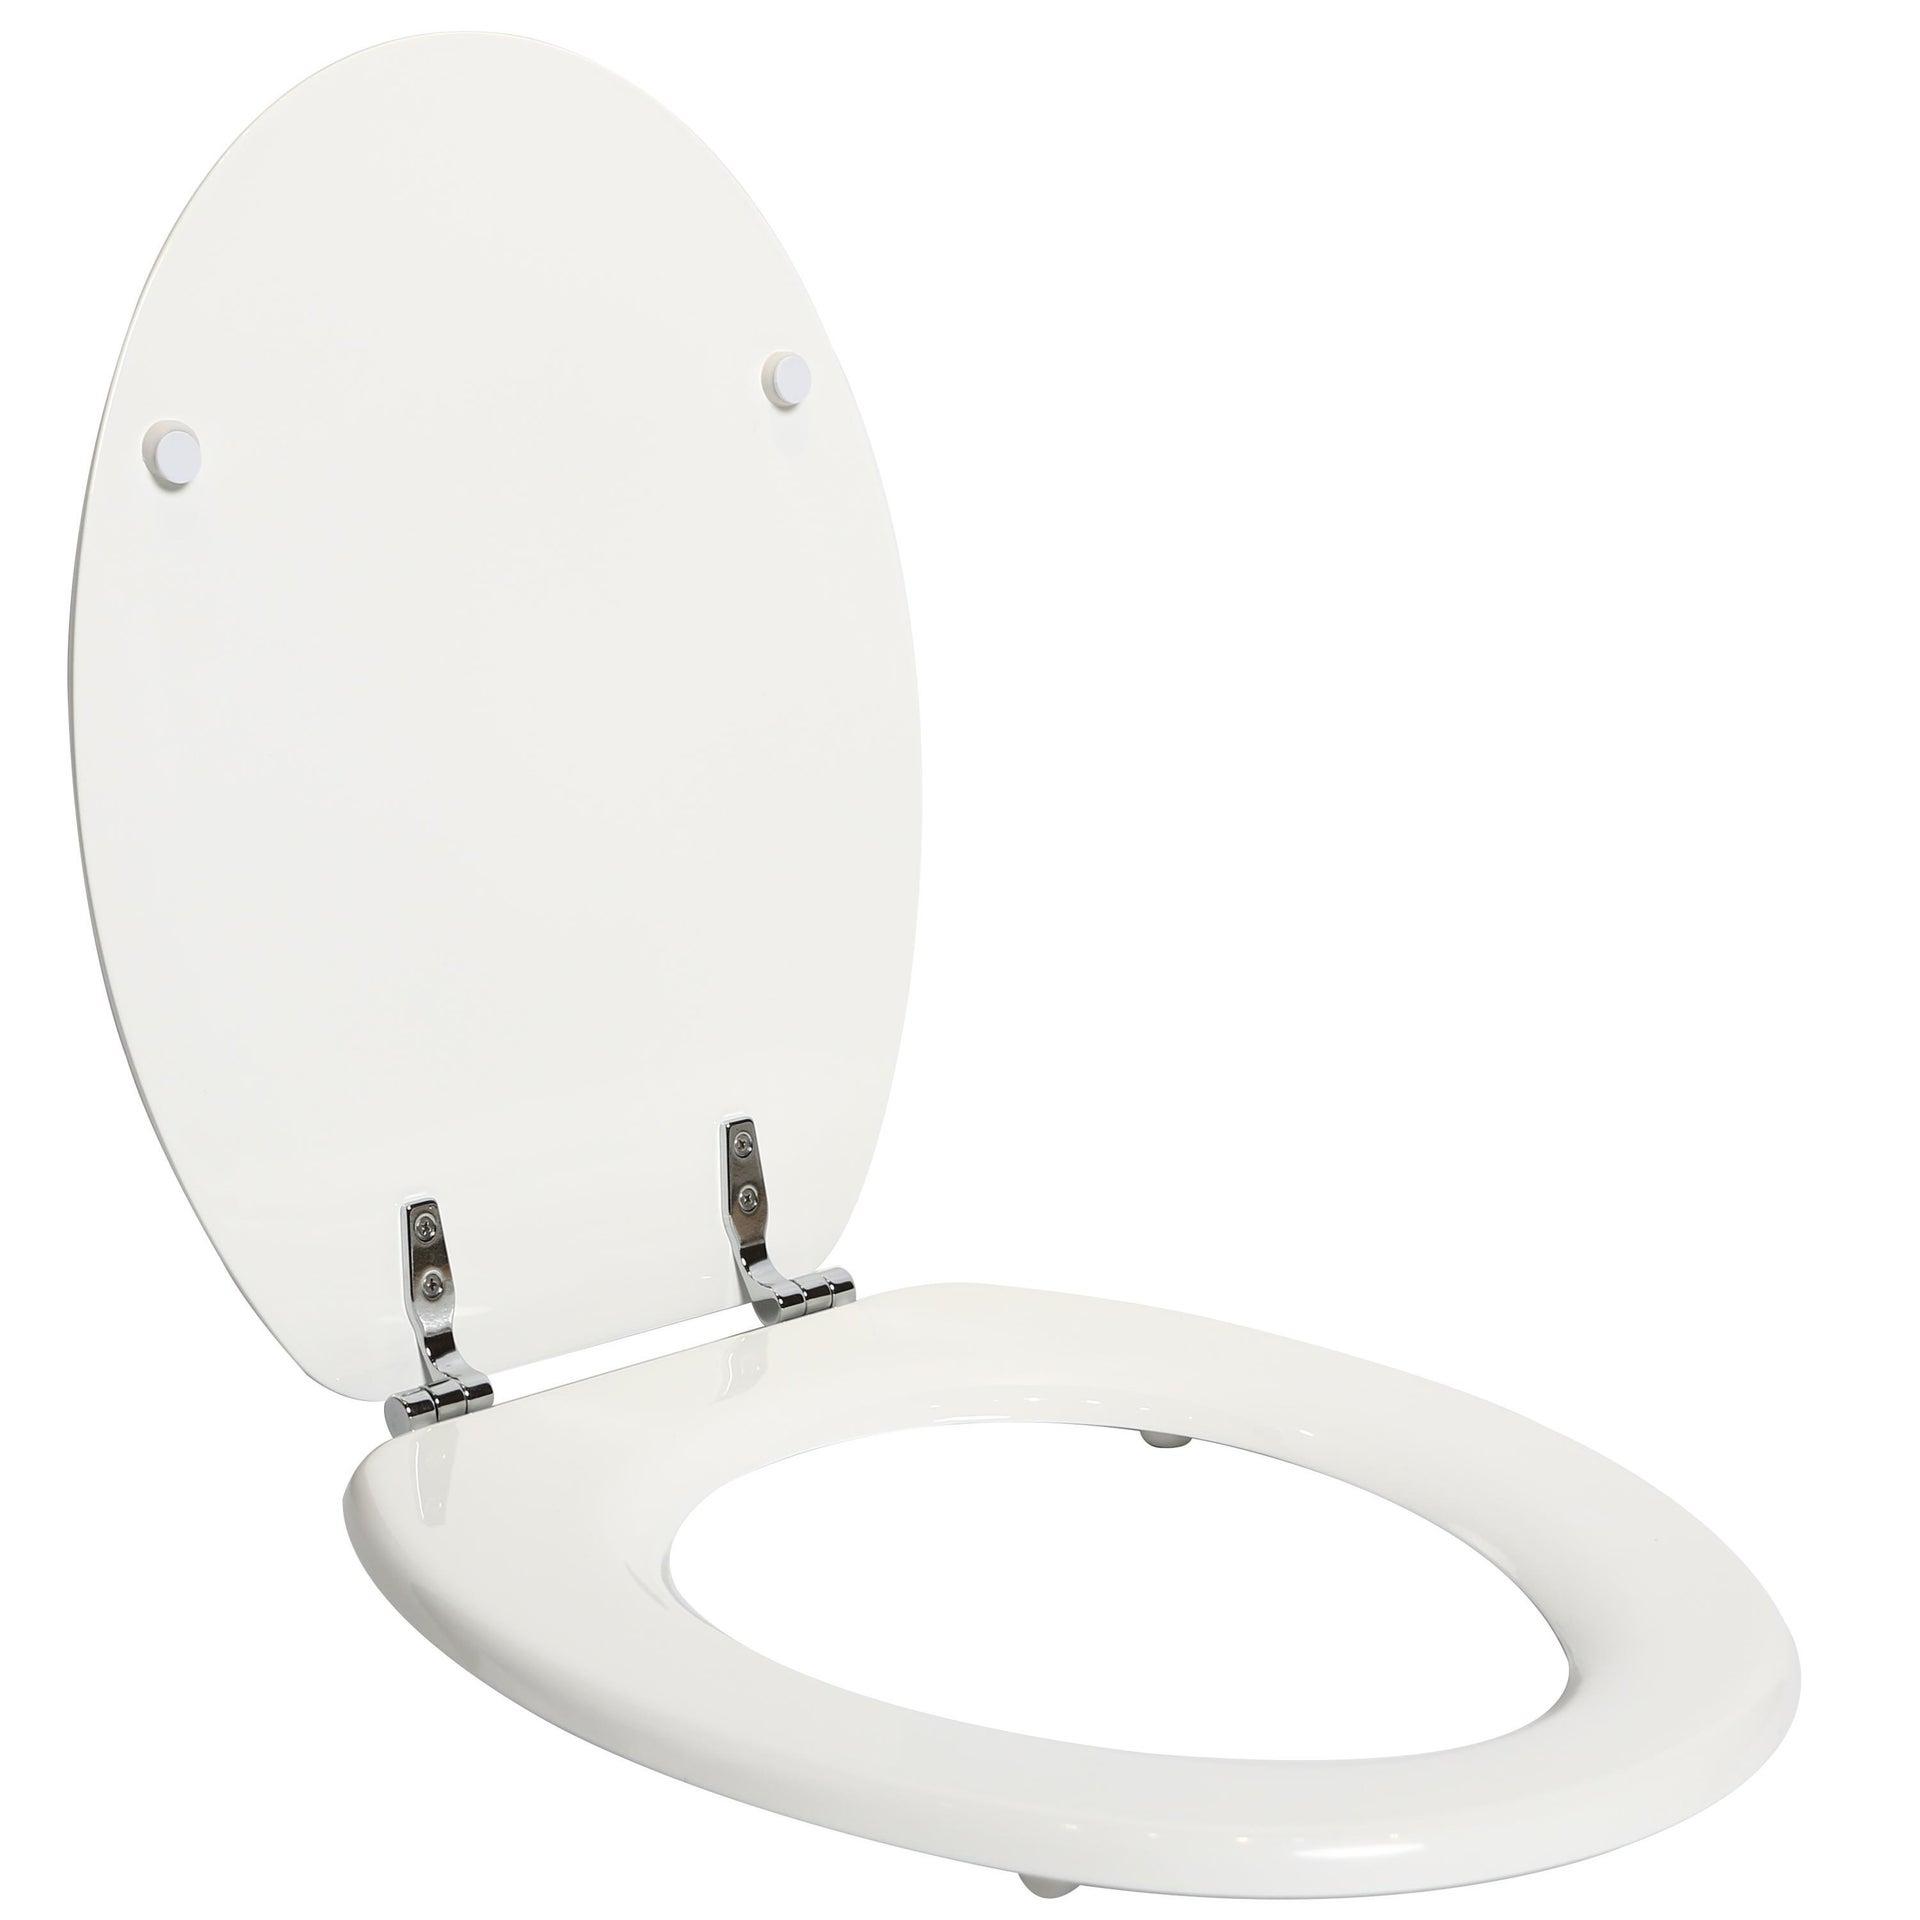 Copriwater ovale Universale Pop SENSEA mdf bianco - 3